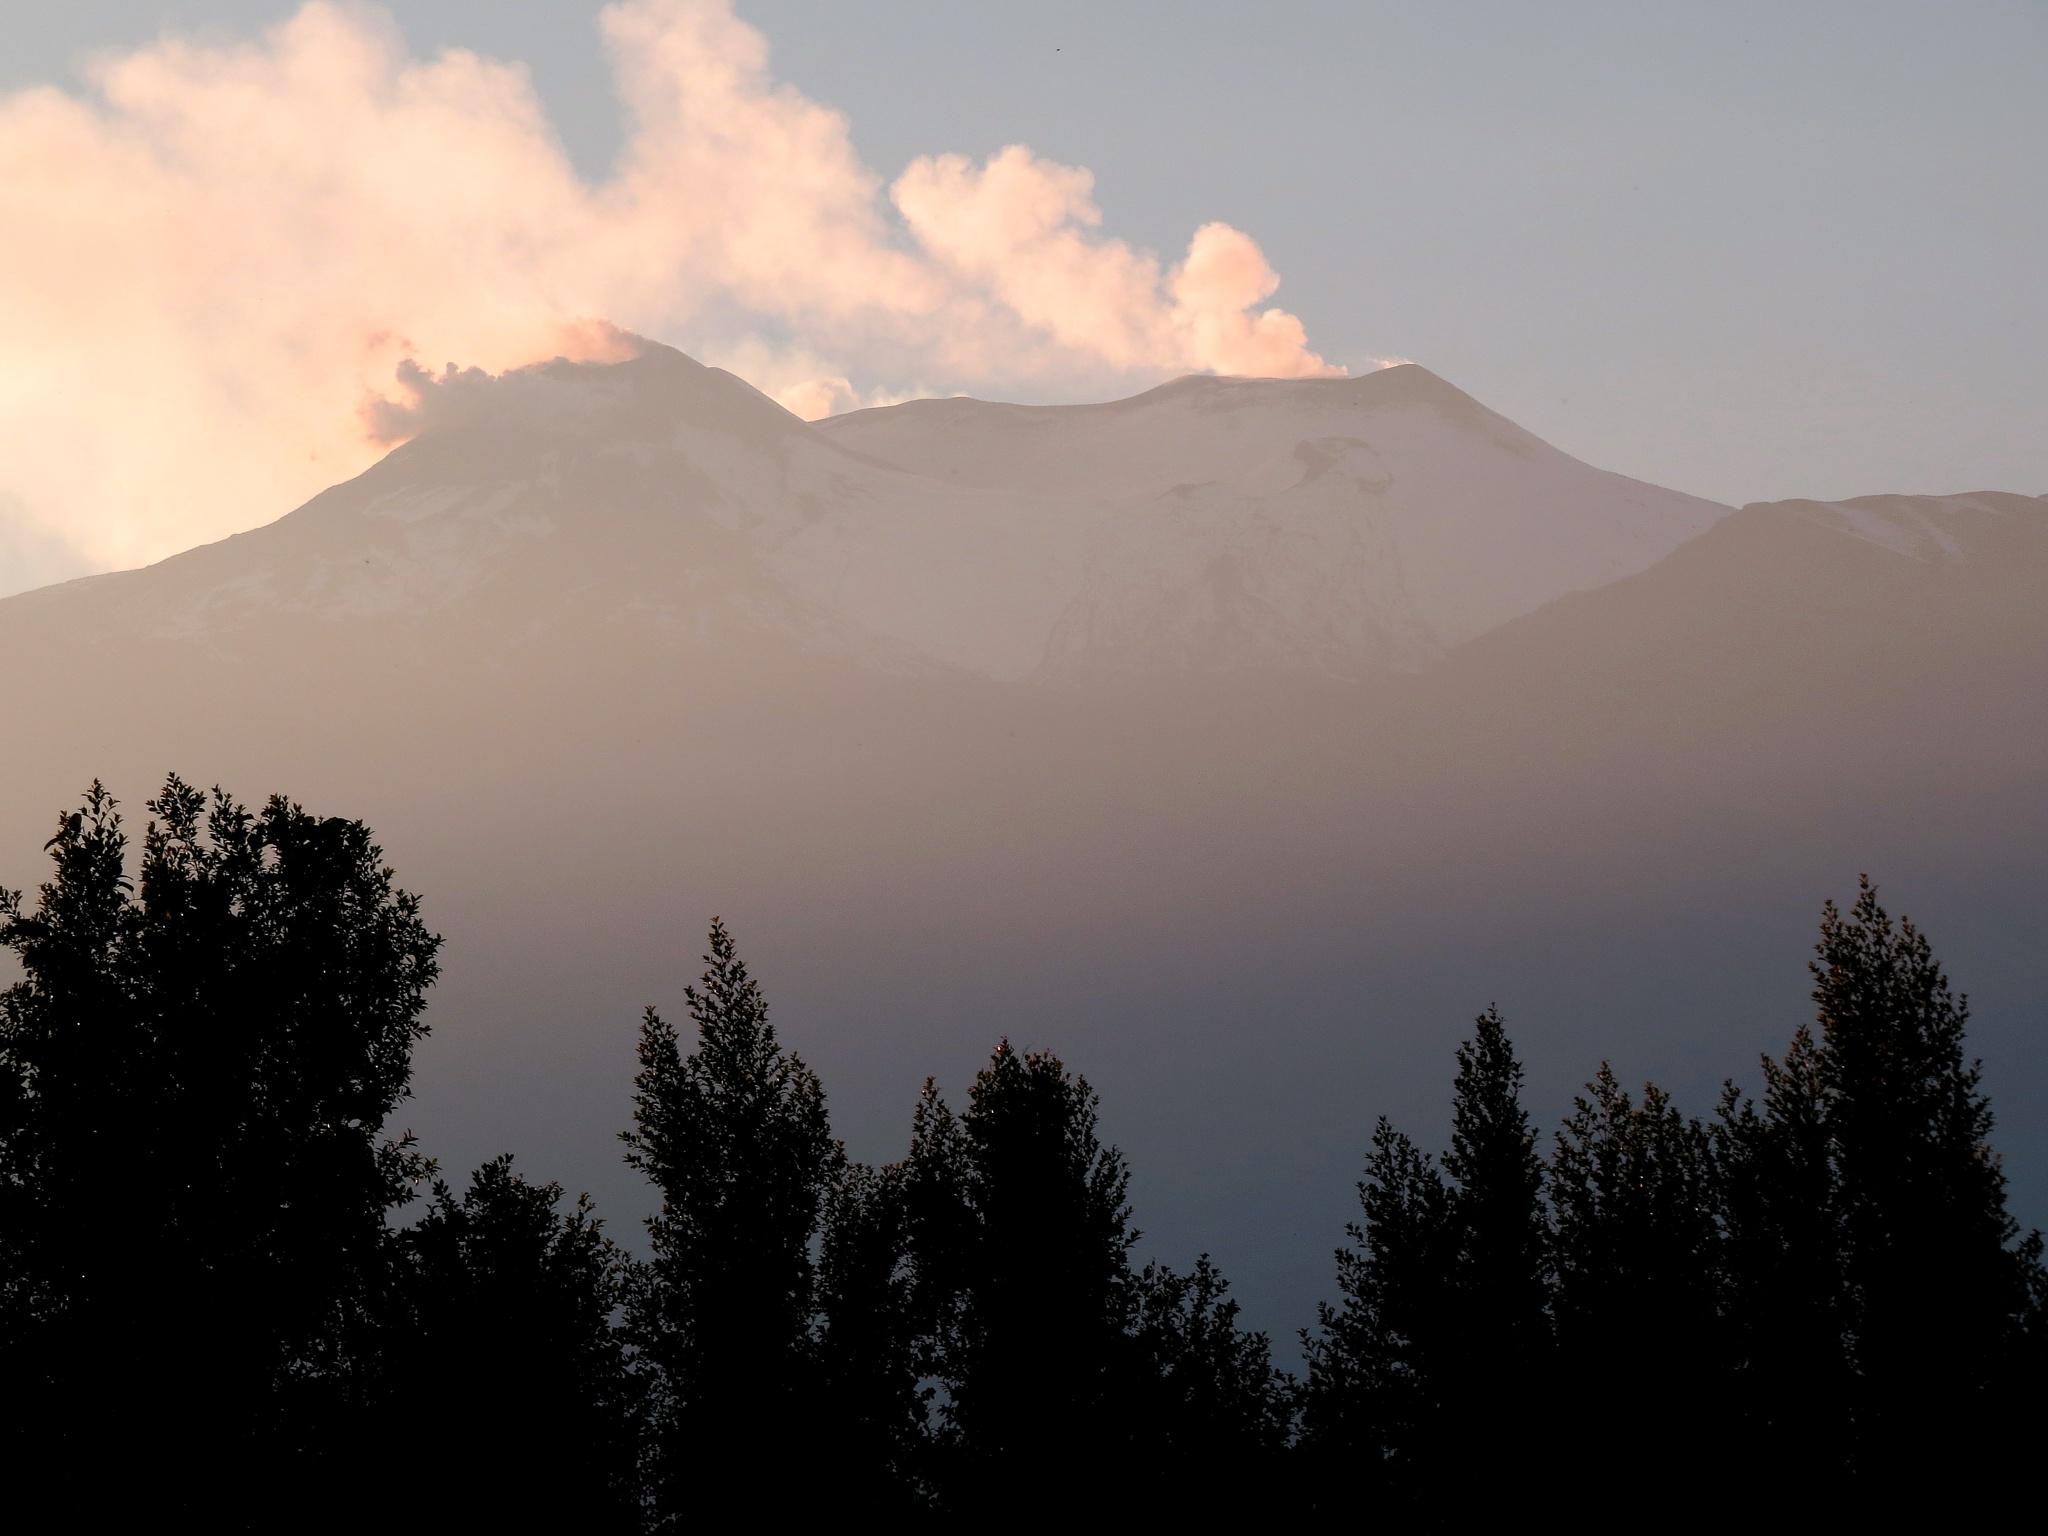 Sunset on mount Etna by aurelio.spina